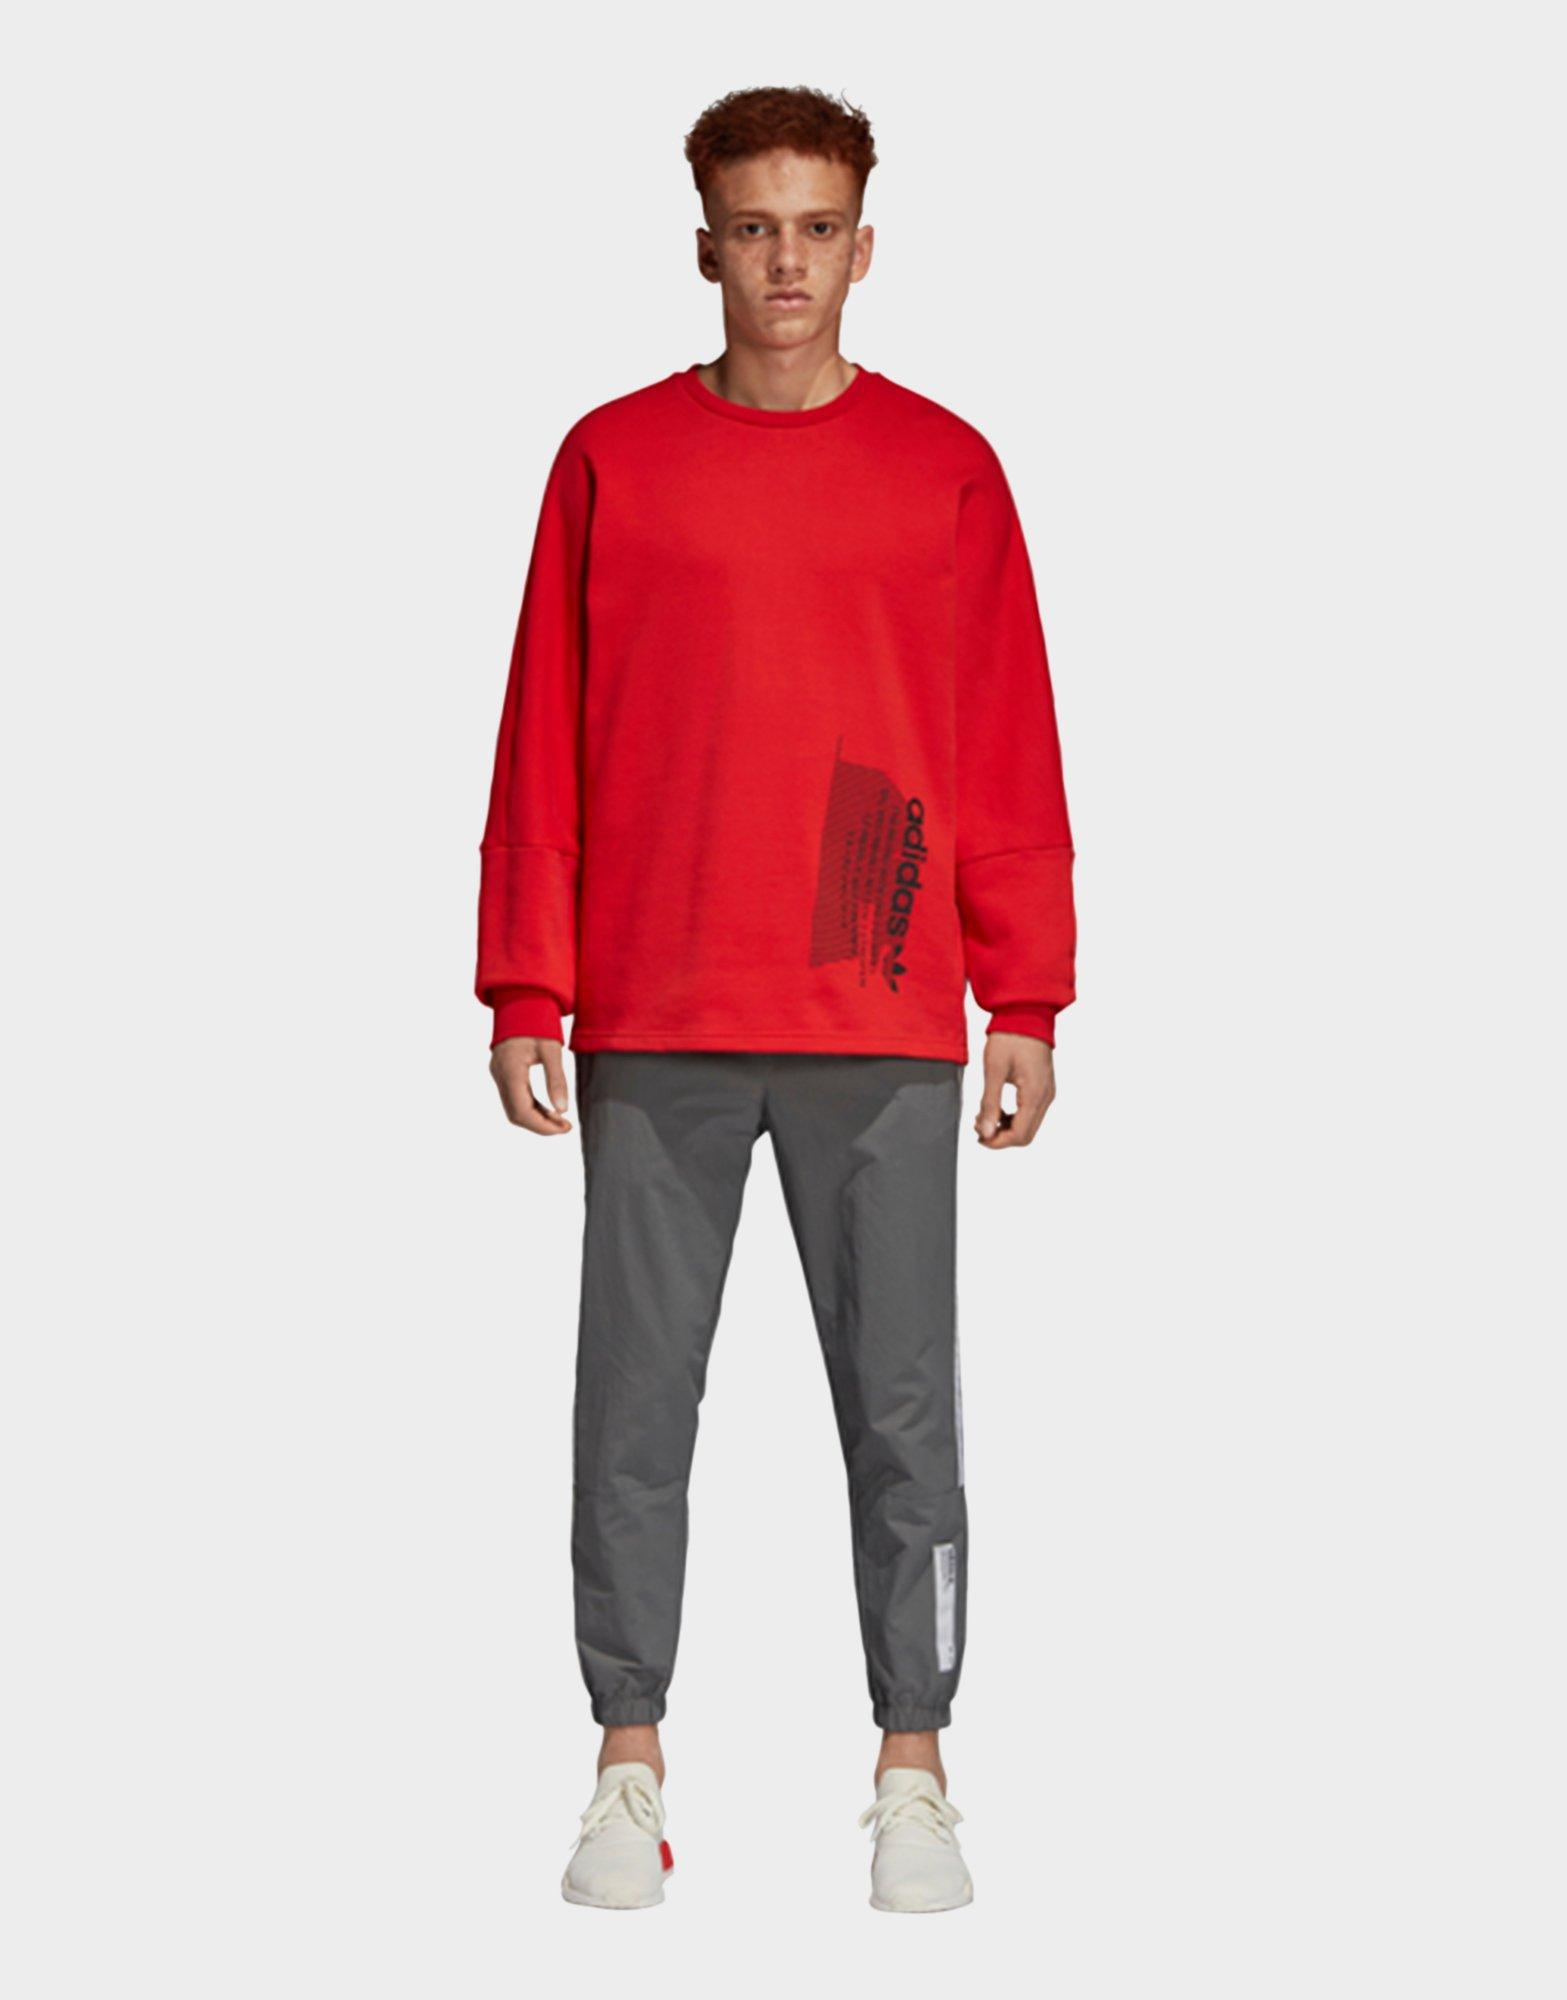 0f2e95db78116 Lyst - Adidas Nmd Sweatshirt in Red for Men